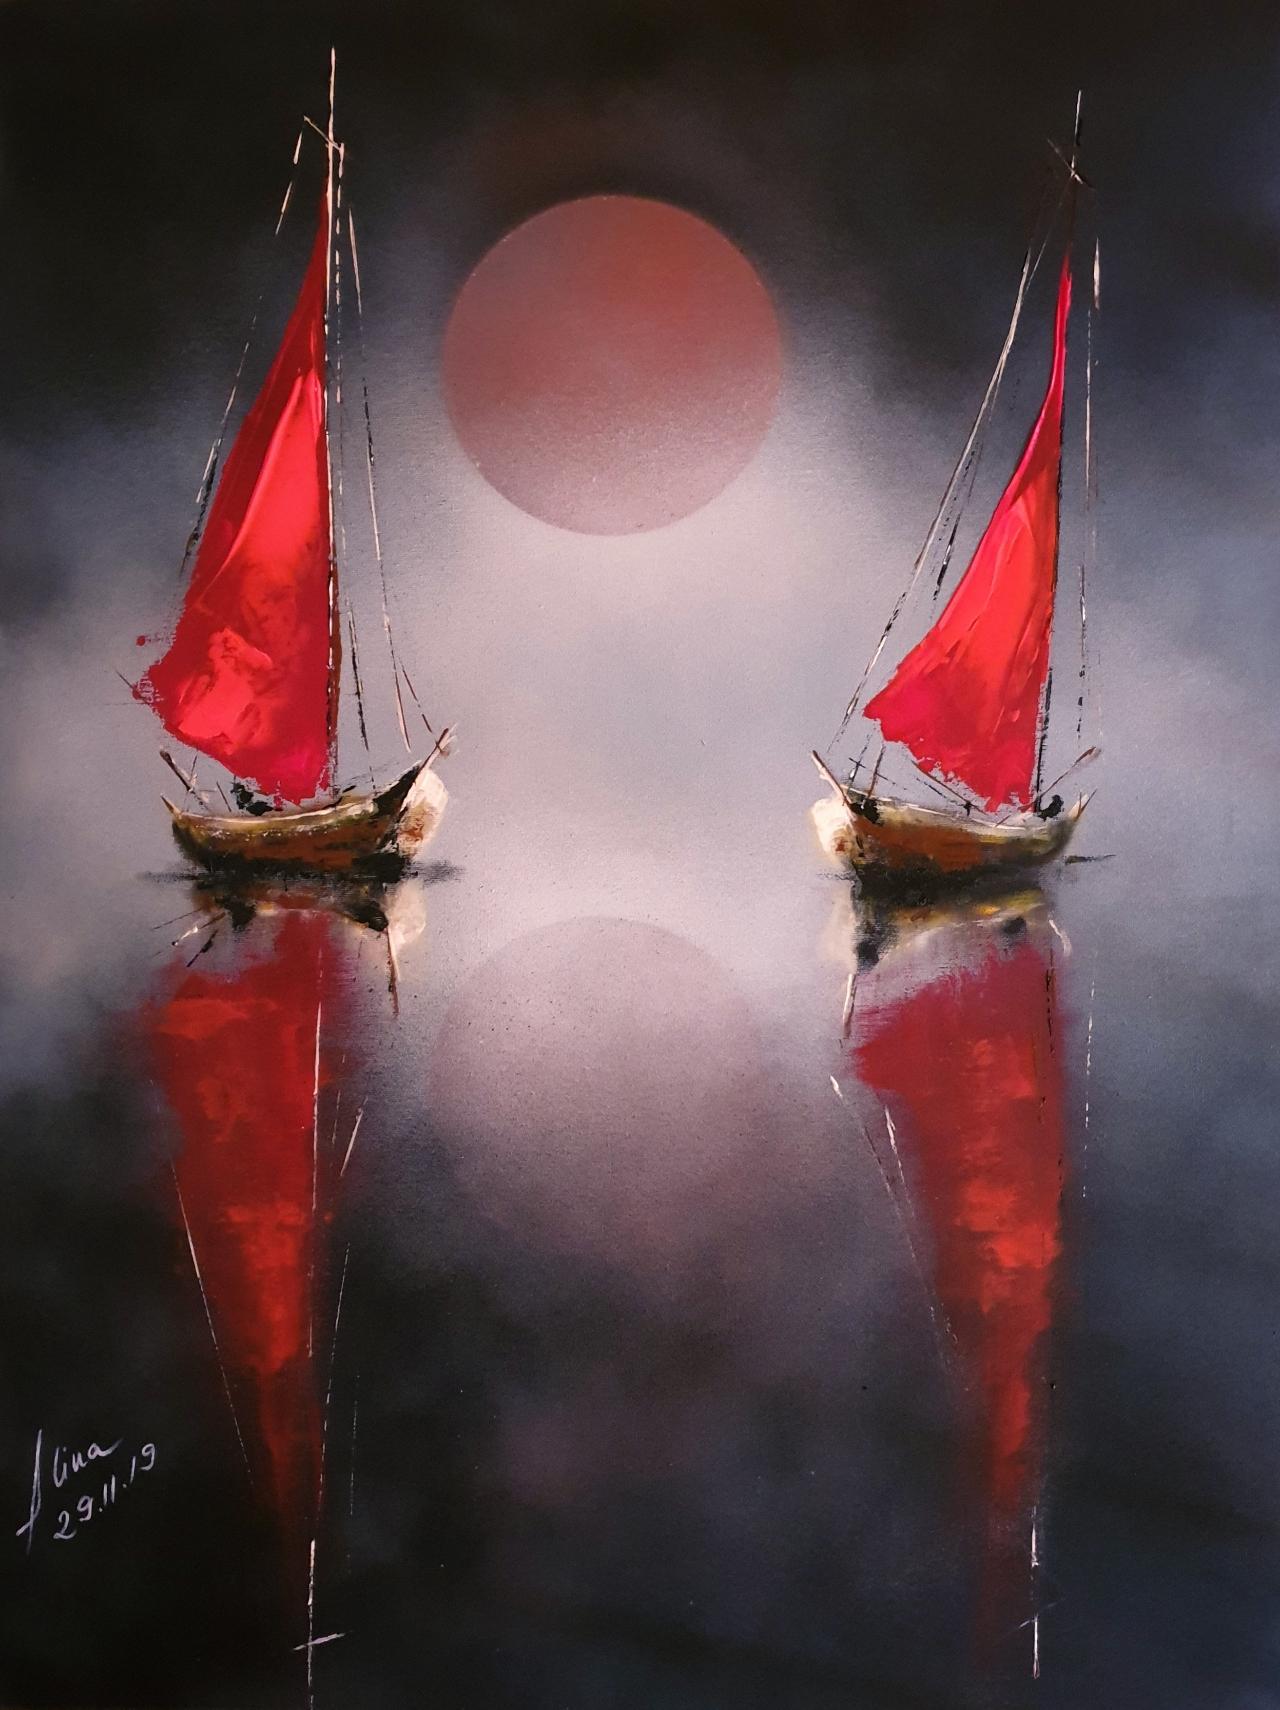 ArteDiAlina.com painting: Mysterious love